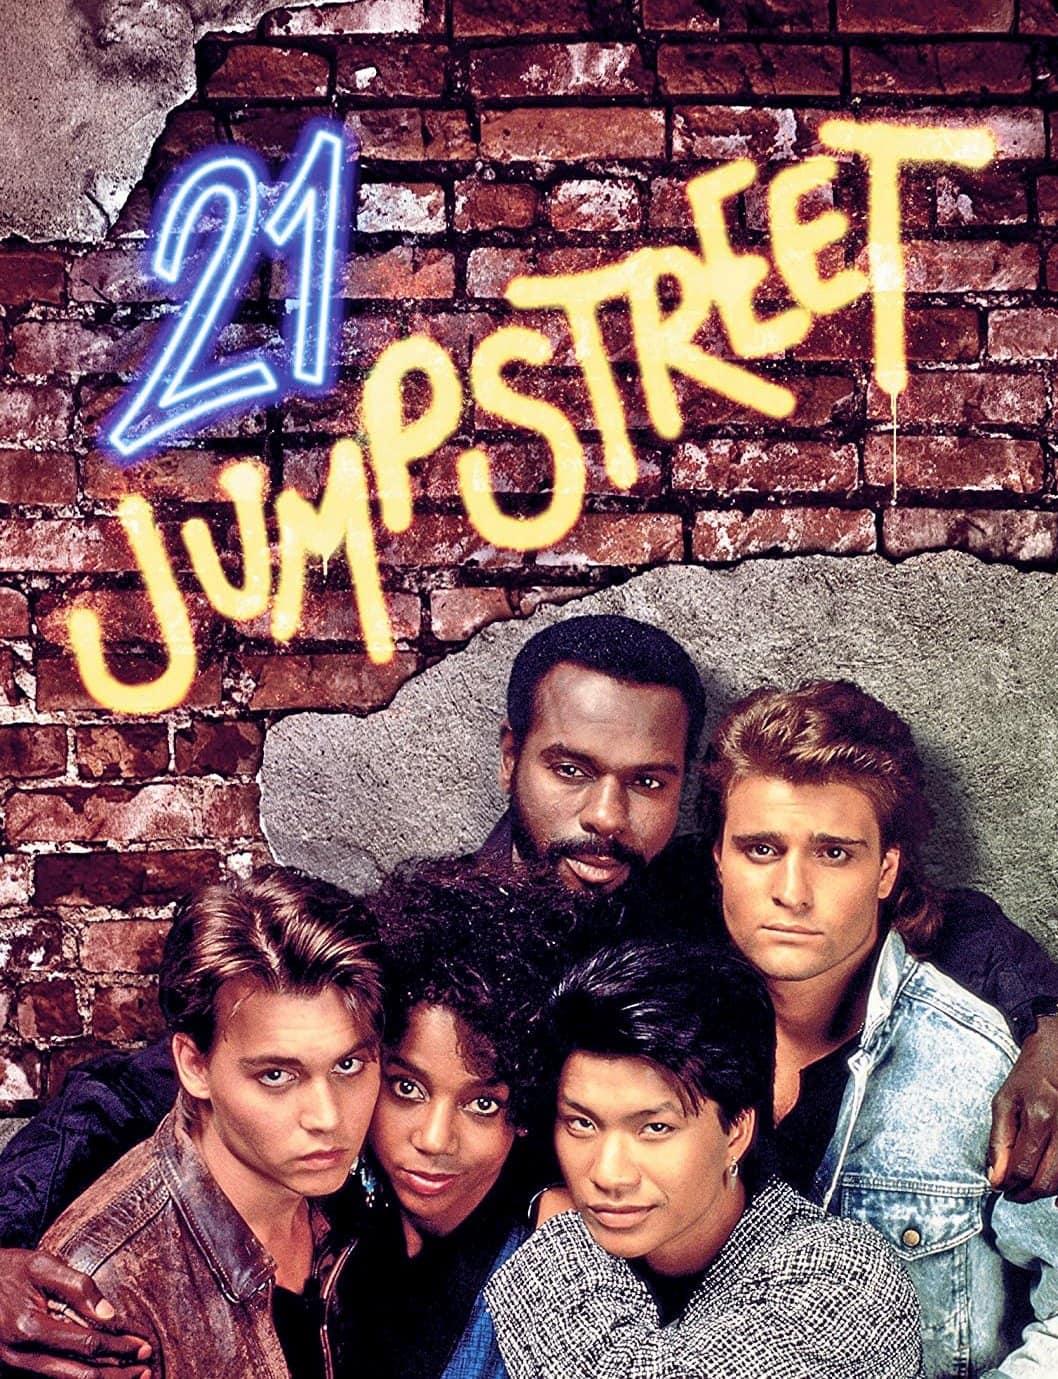 21 Jump Street TV series